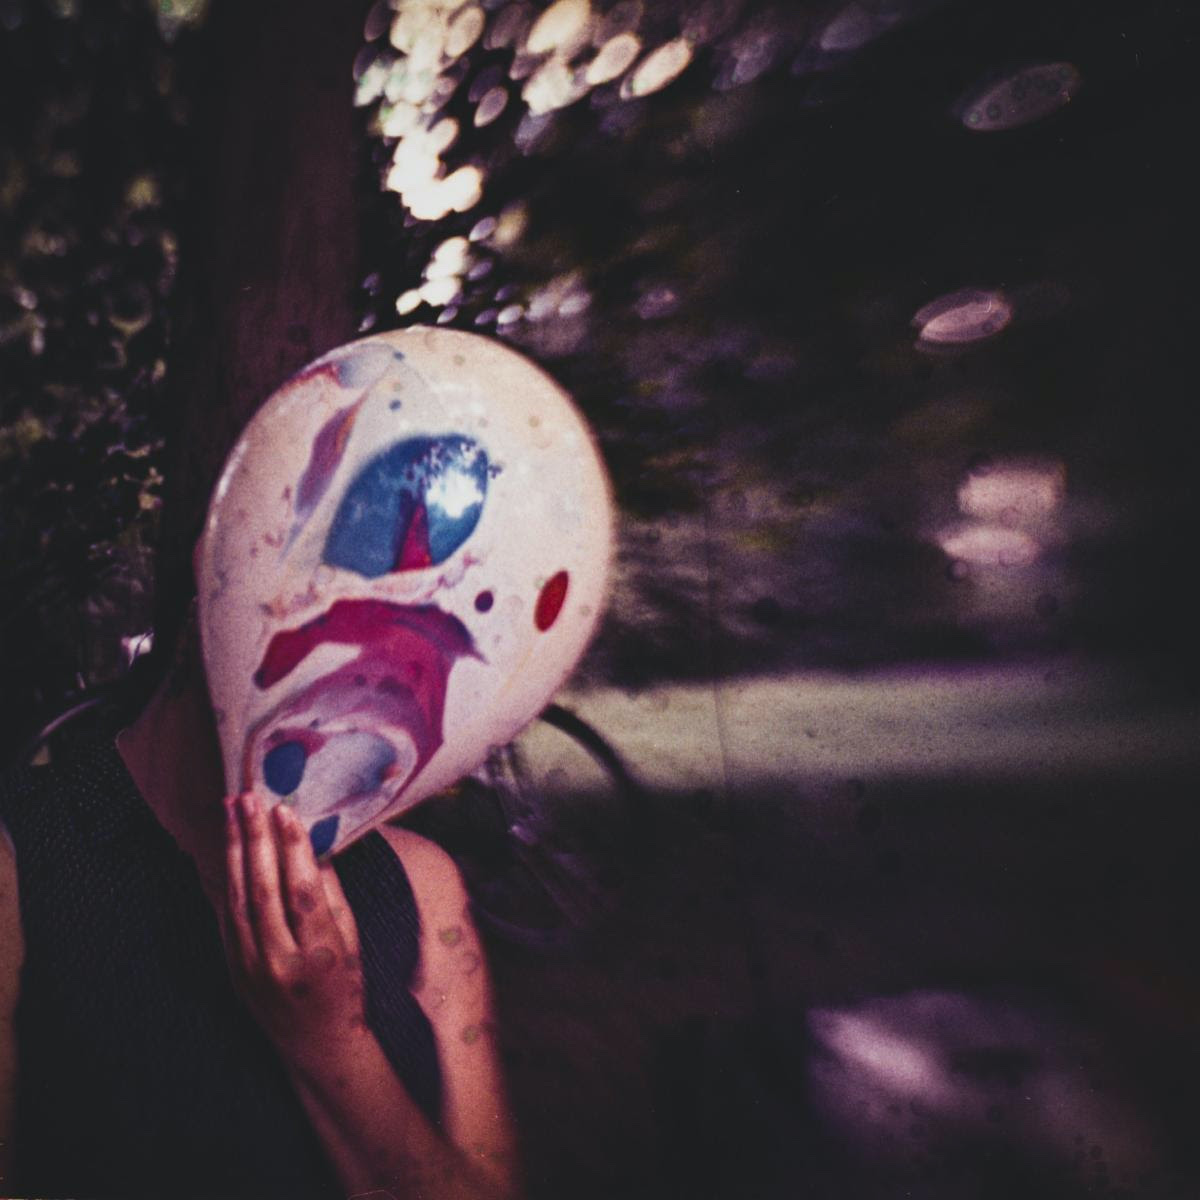 josh klinghoffer pluralone i dont feel well artwork cover Josh Klinghoffers Pluralone Announces New Album, Shares The Night Wont Scare Me: Stream